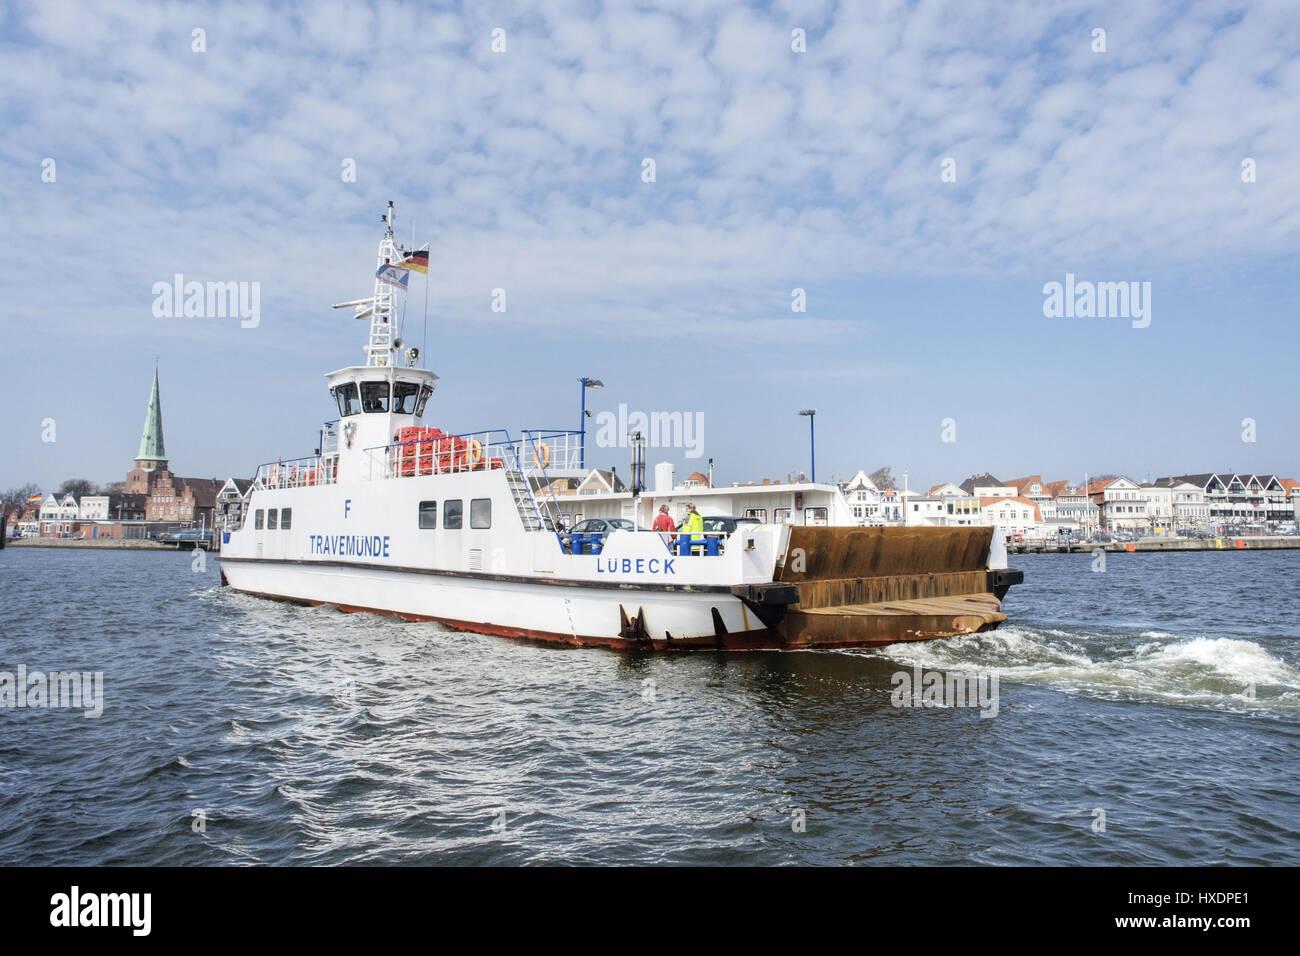 Car ferry in Travem?nde, Autofaehre in Travemuende - Stock Image